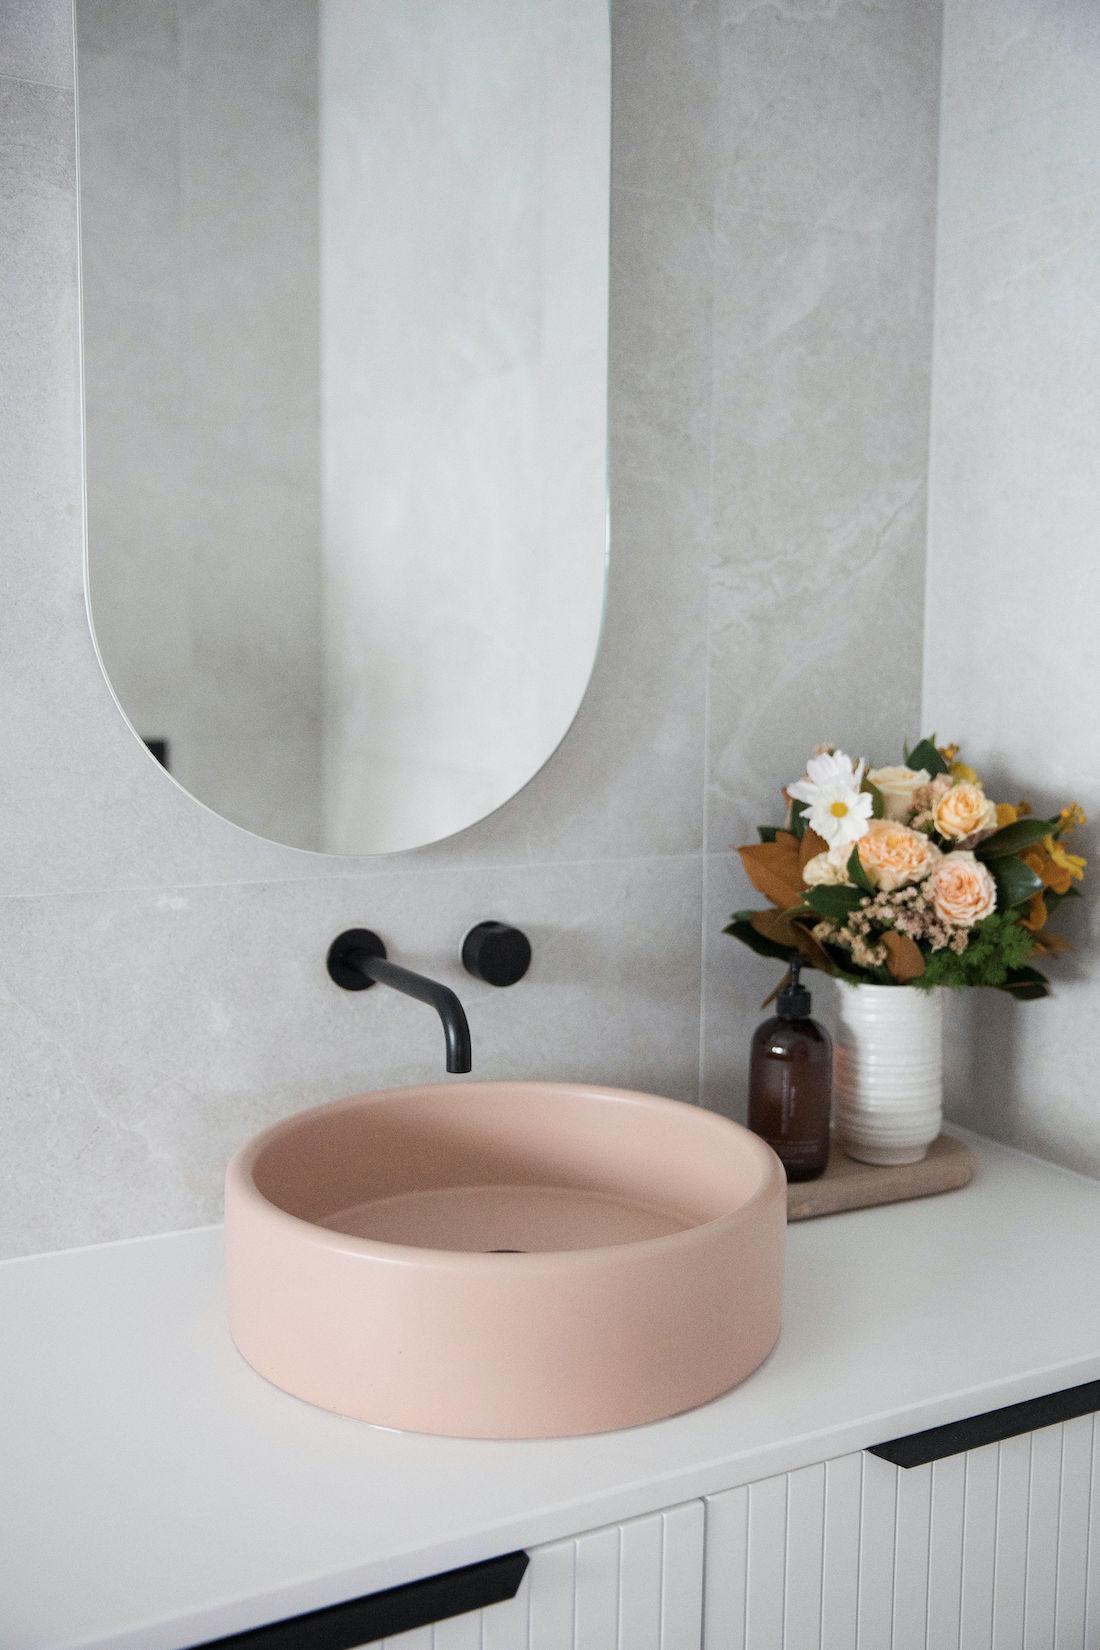 Nood basin in Bathroom renovation